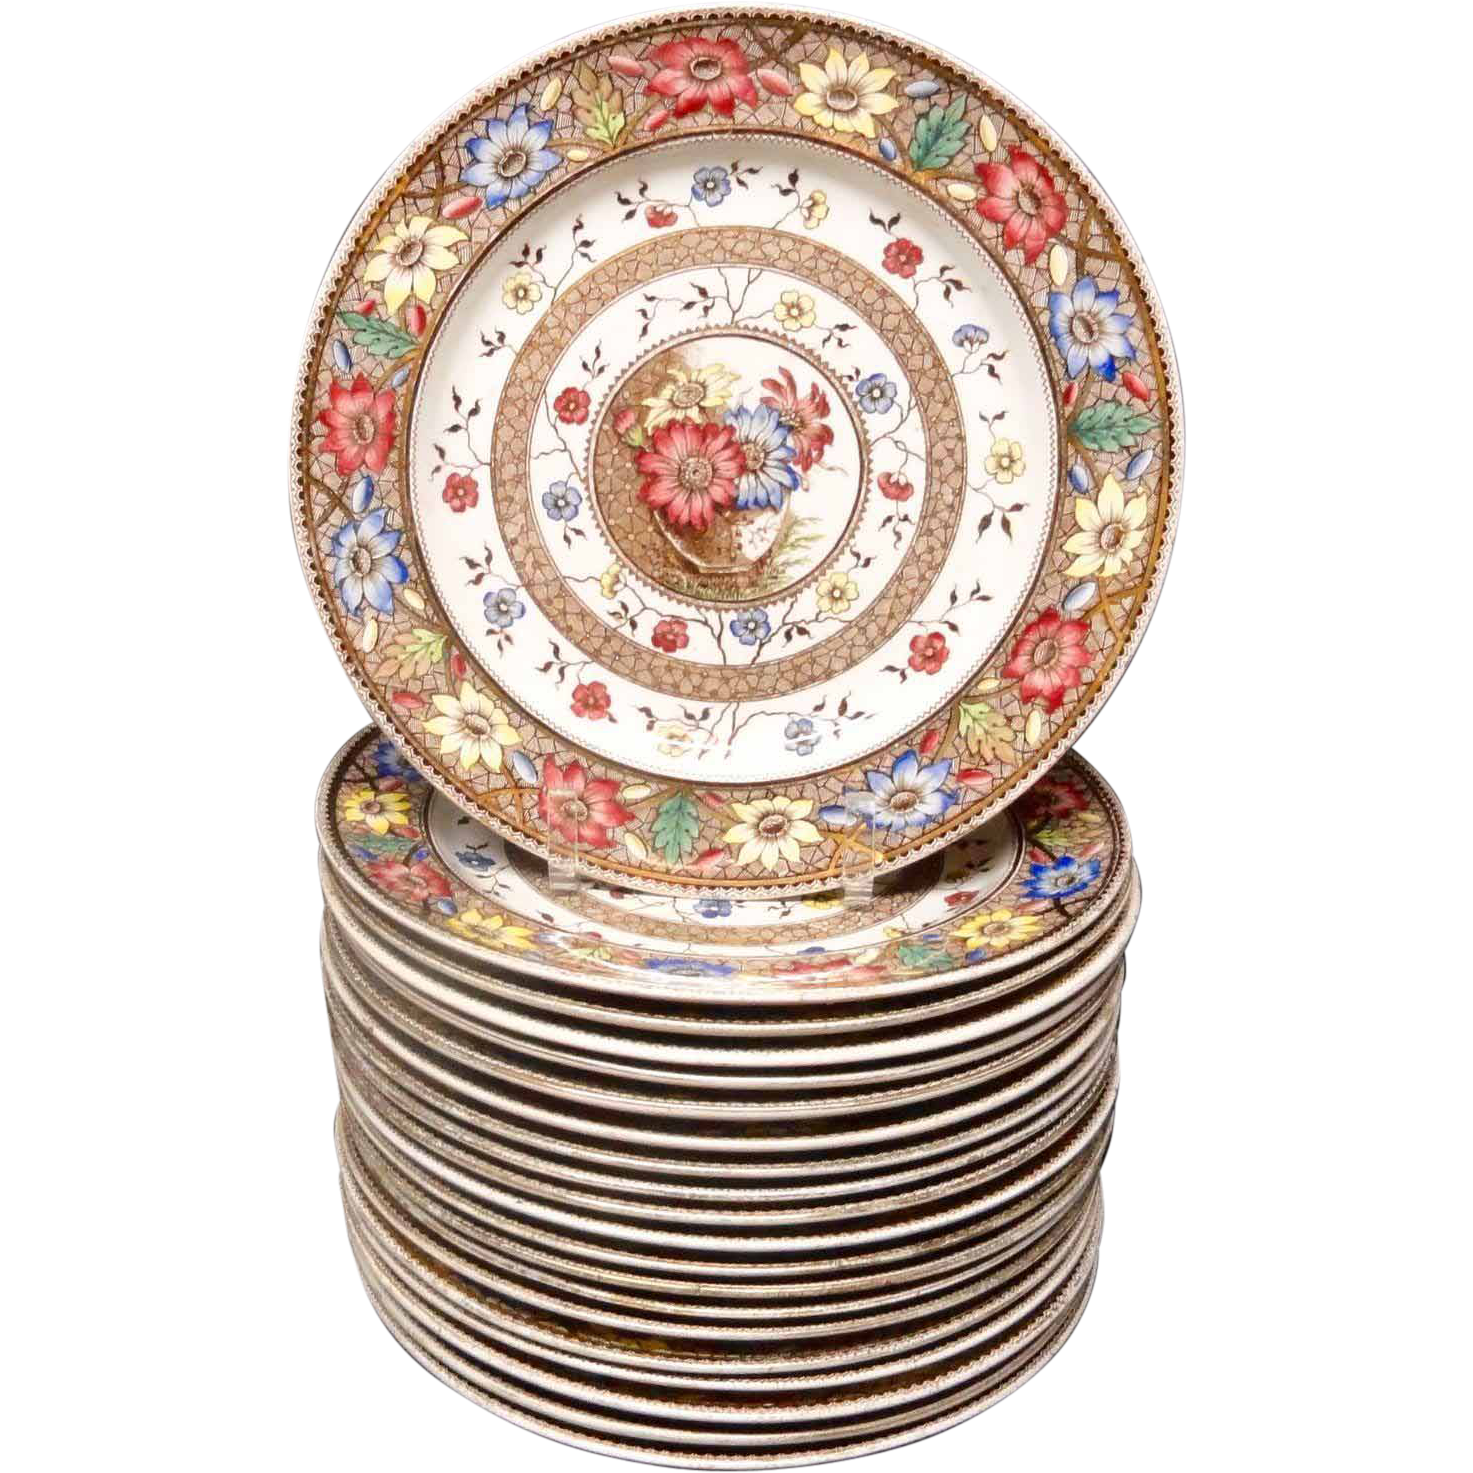 Twenty 20 Aesthetic Brown Transferware Plates ~ SUNFLOWERS 1883